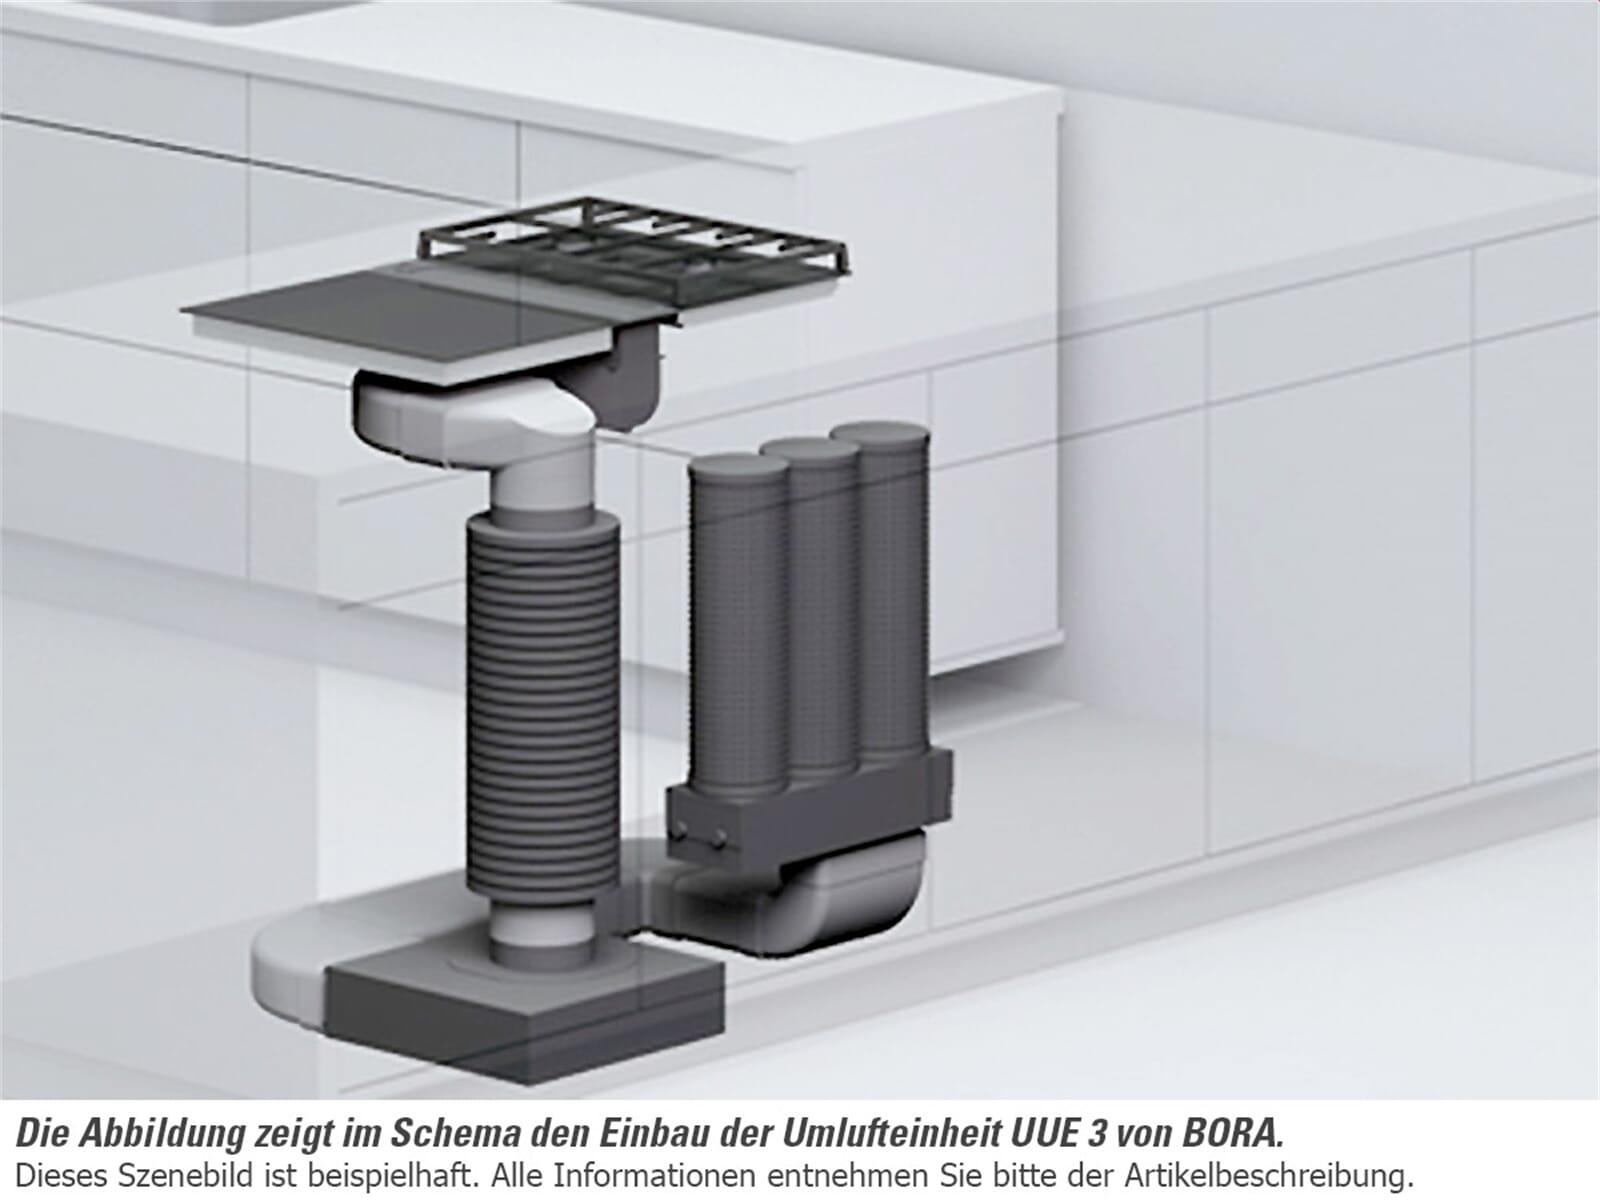 Dunstabzug küche test kochfeld mit integriertem dunstabzug test